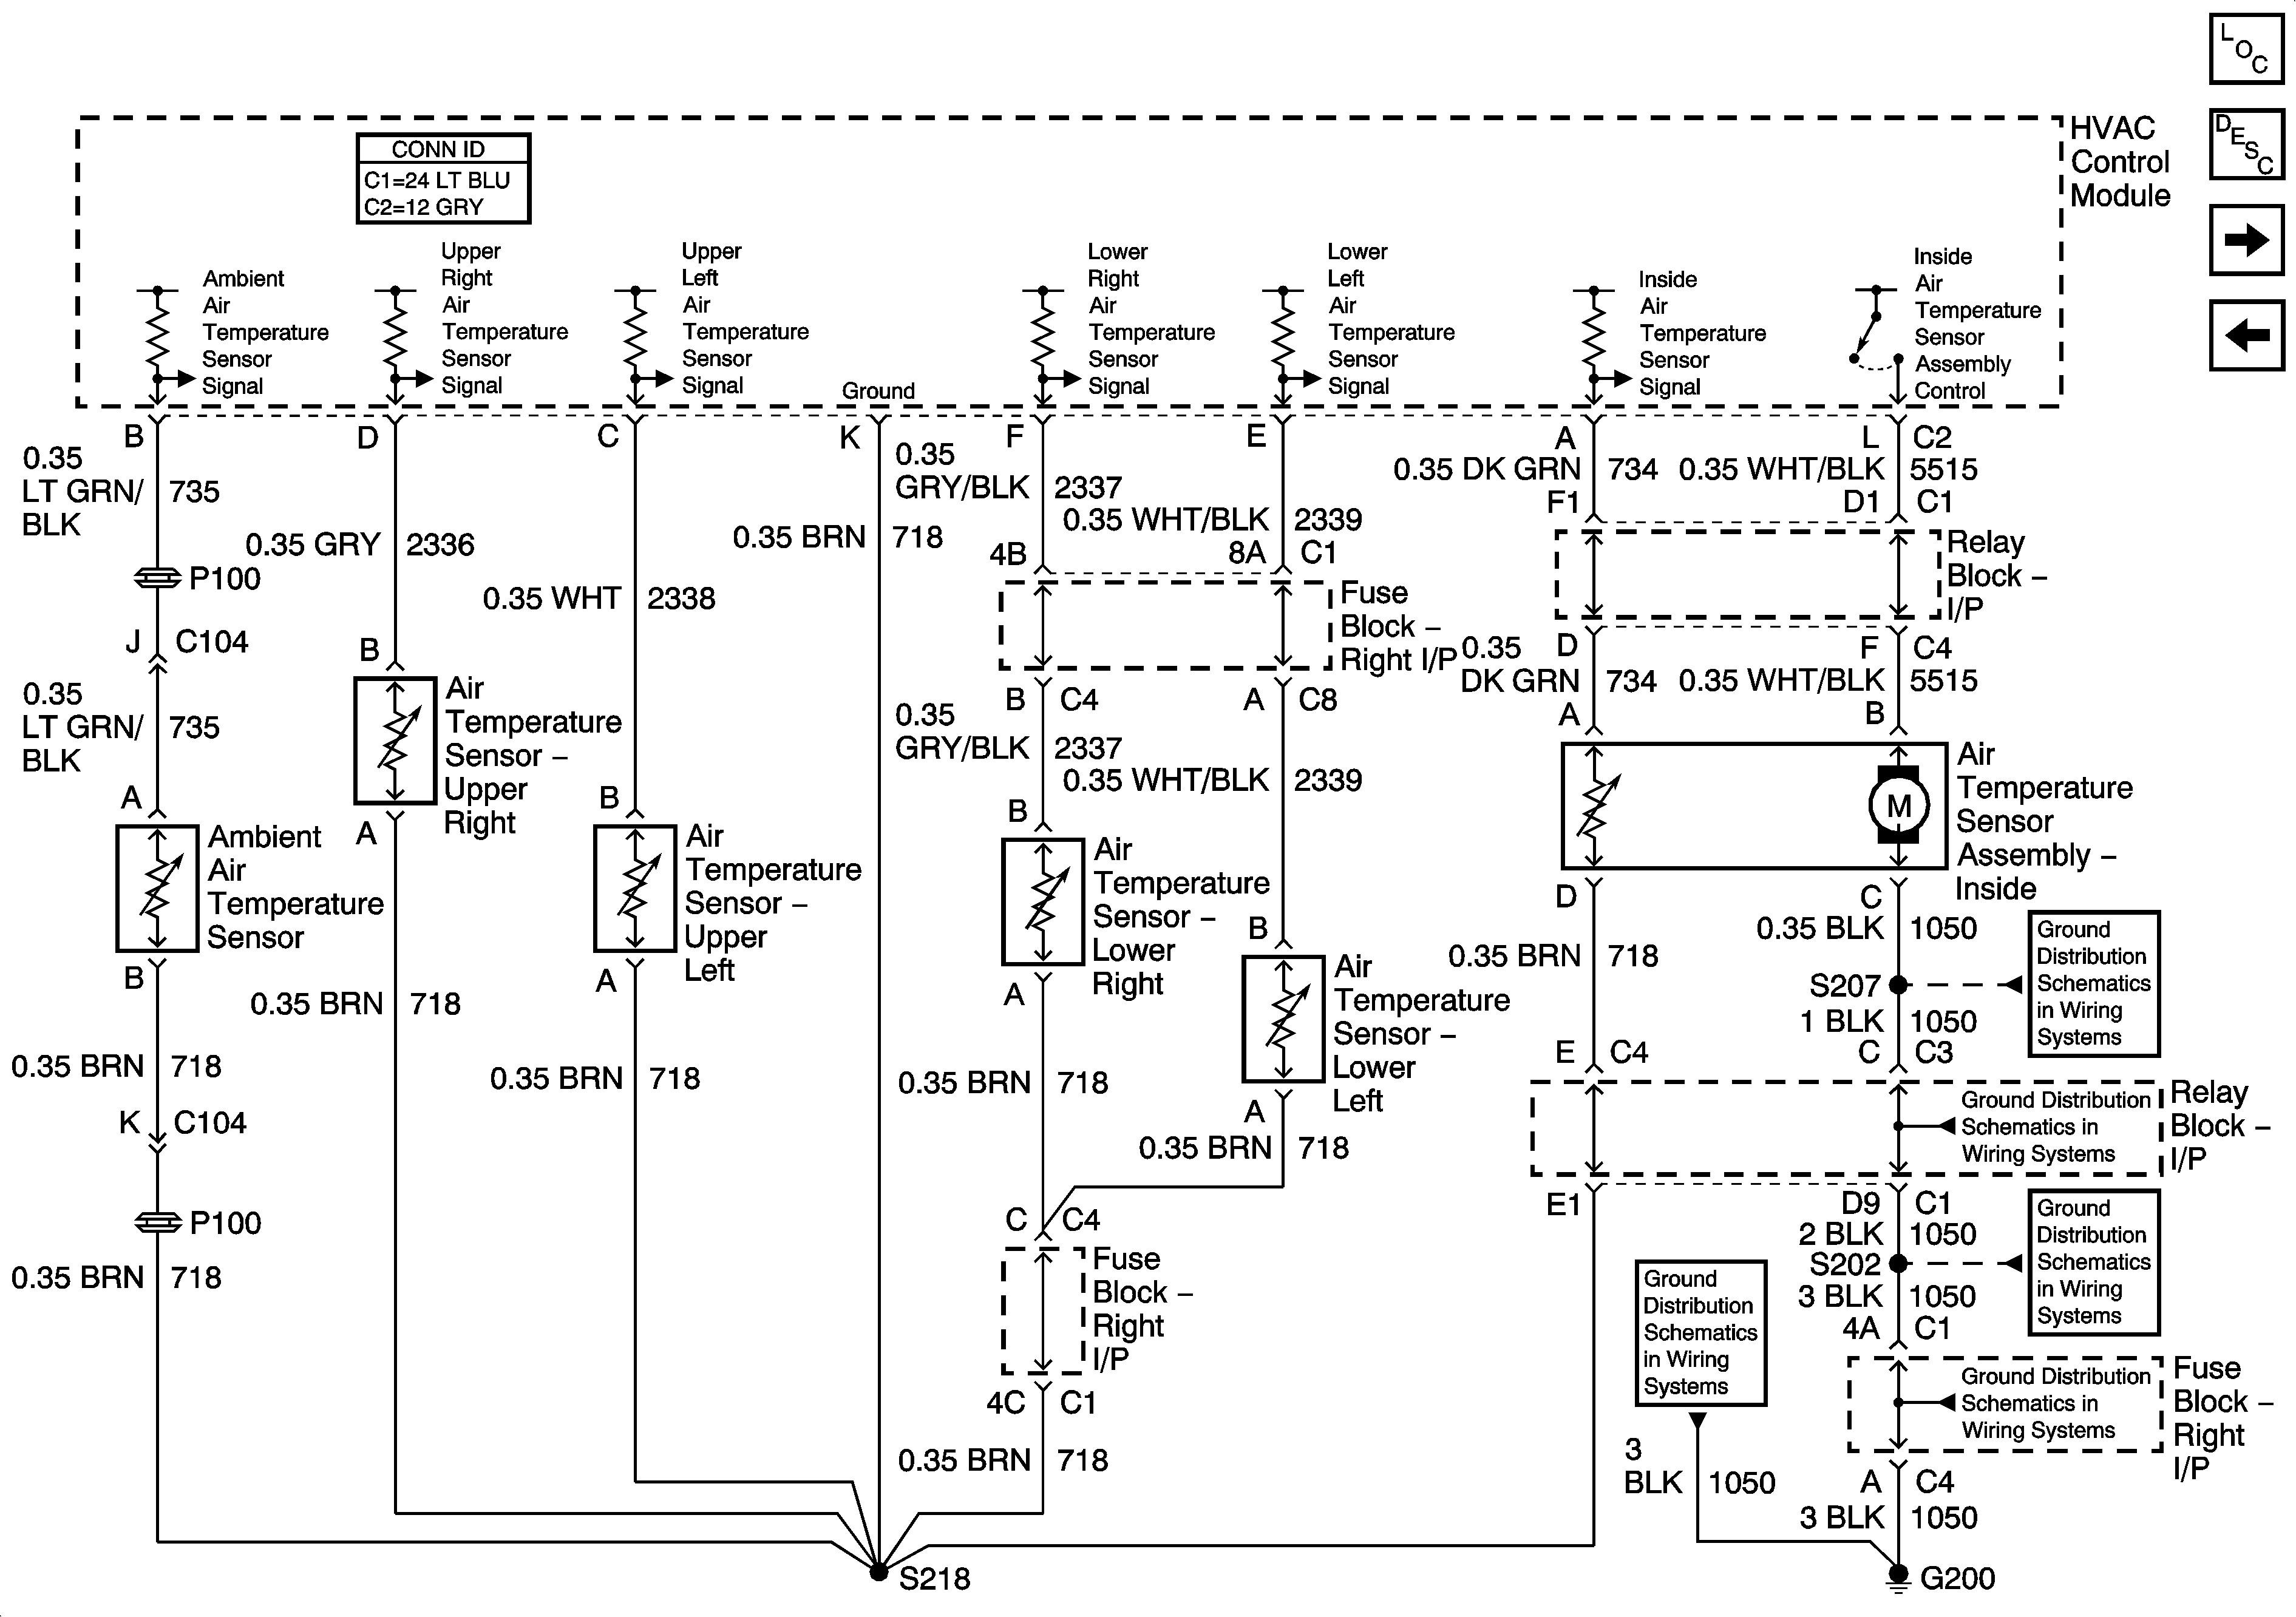 2003 chevy trailblazer radio wiring diagram gs 3640  2003 chevrolet trailblazer radio wiring diagram schematic  2003 chevrolet trailblazer radio wiring